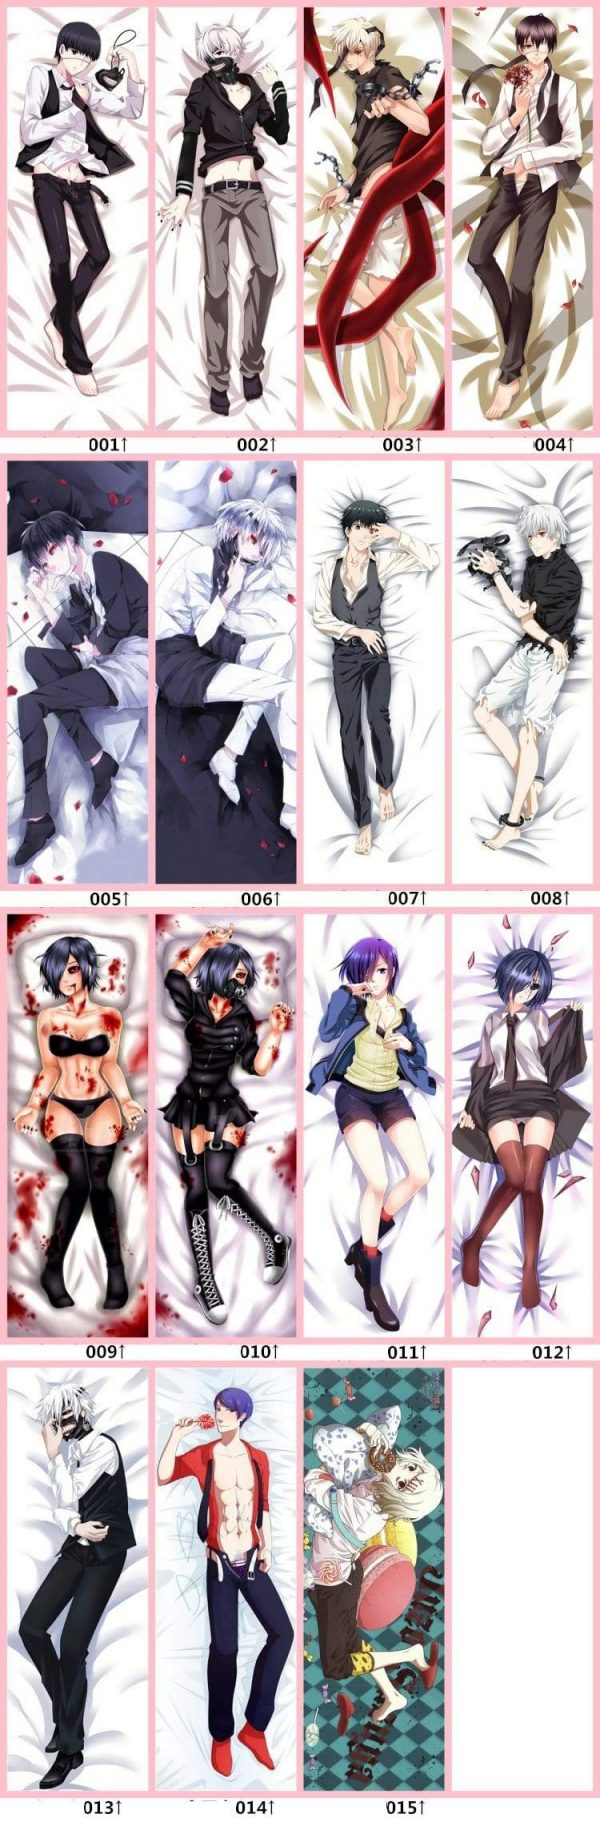 Rize Body Pillow, Tokyo Ghoul Anime DakimakuraOfficial Tokyo Ghoul Merch